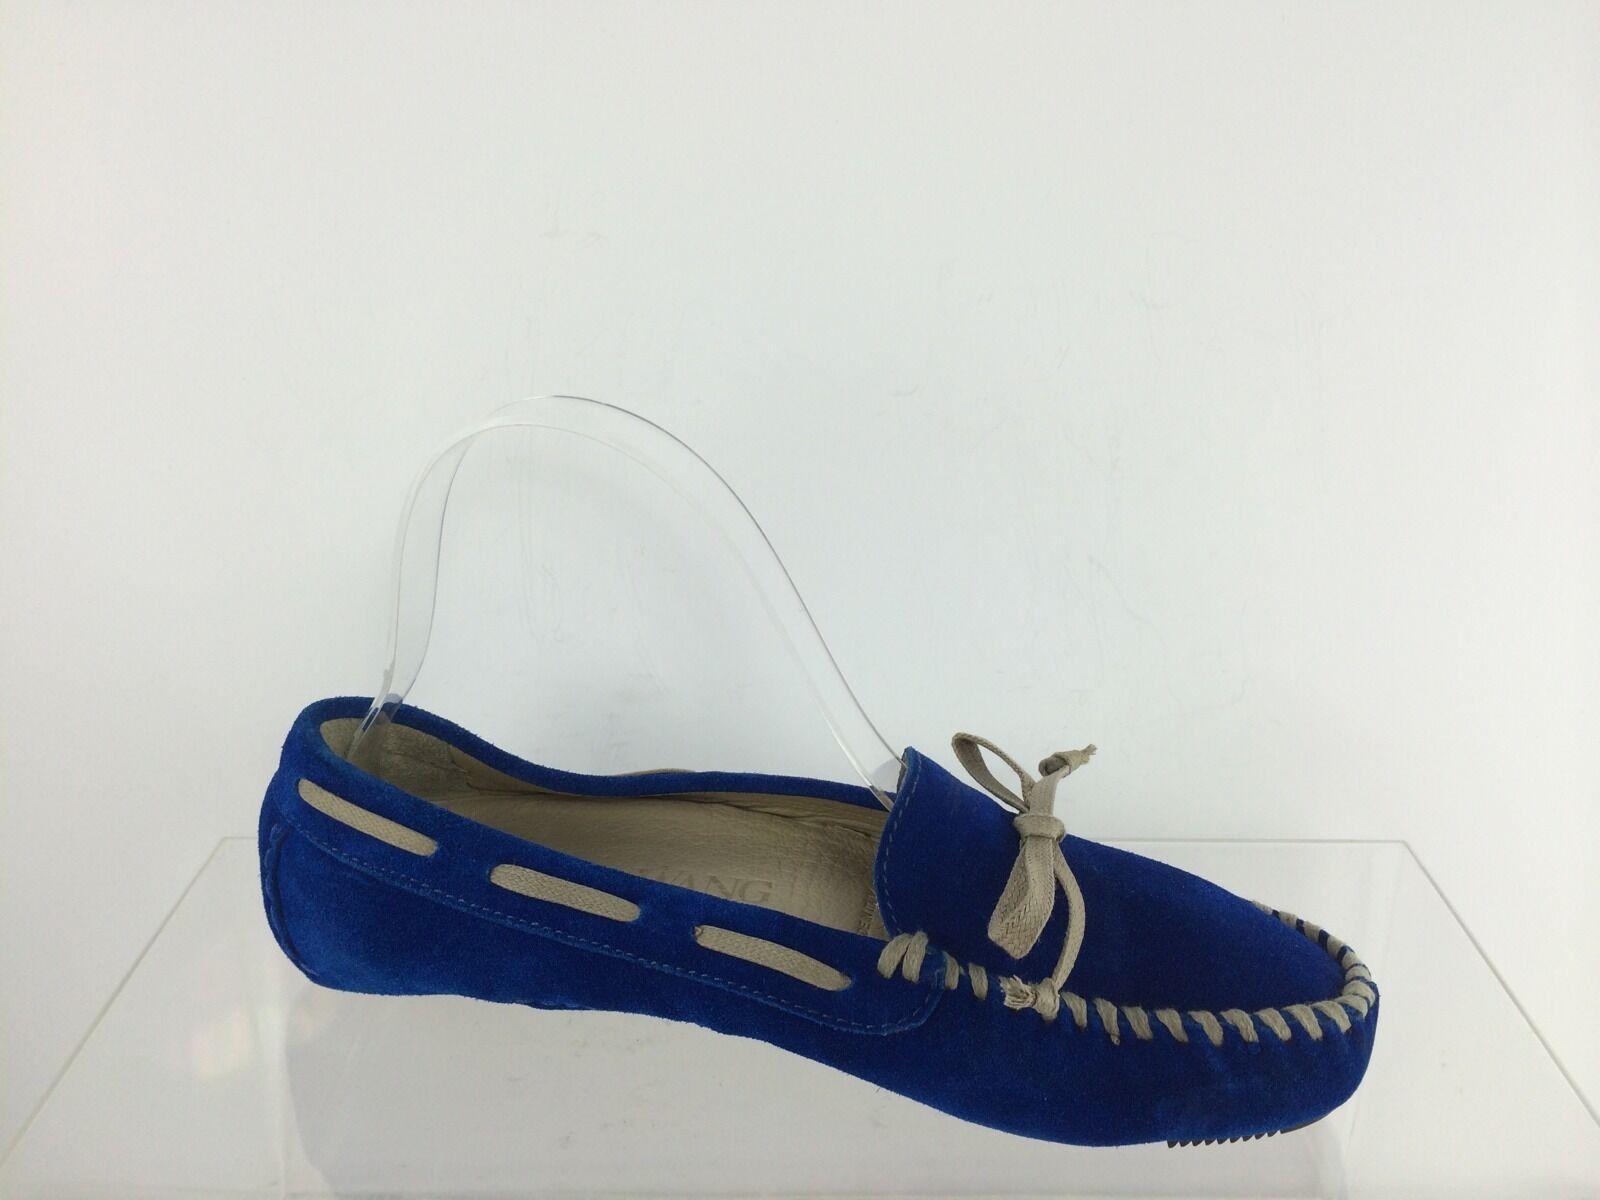 Vera Wang Damenschuhe Damenschuhe Damenschuhe Suede/Leder Blau Shooes 6 M 90afb8